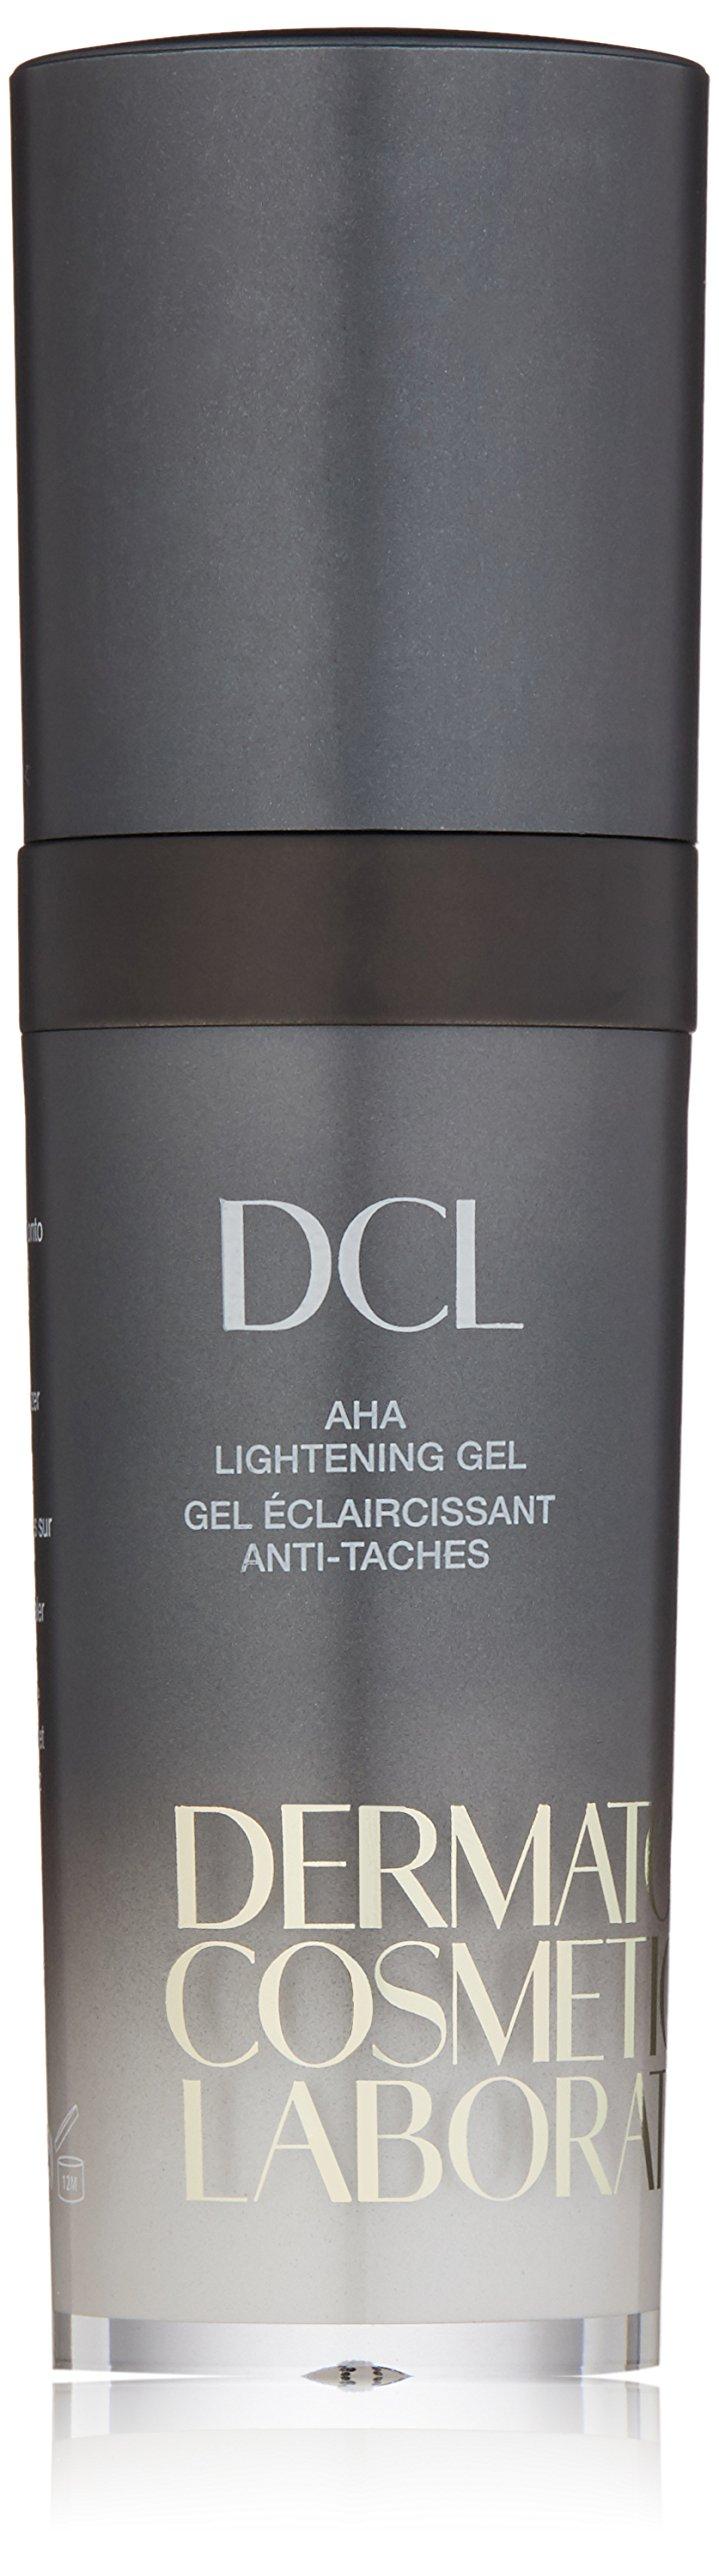 Dermatologic Cosmetic Laboratories AHA Lightening Gel, 1 Fl oz